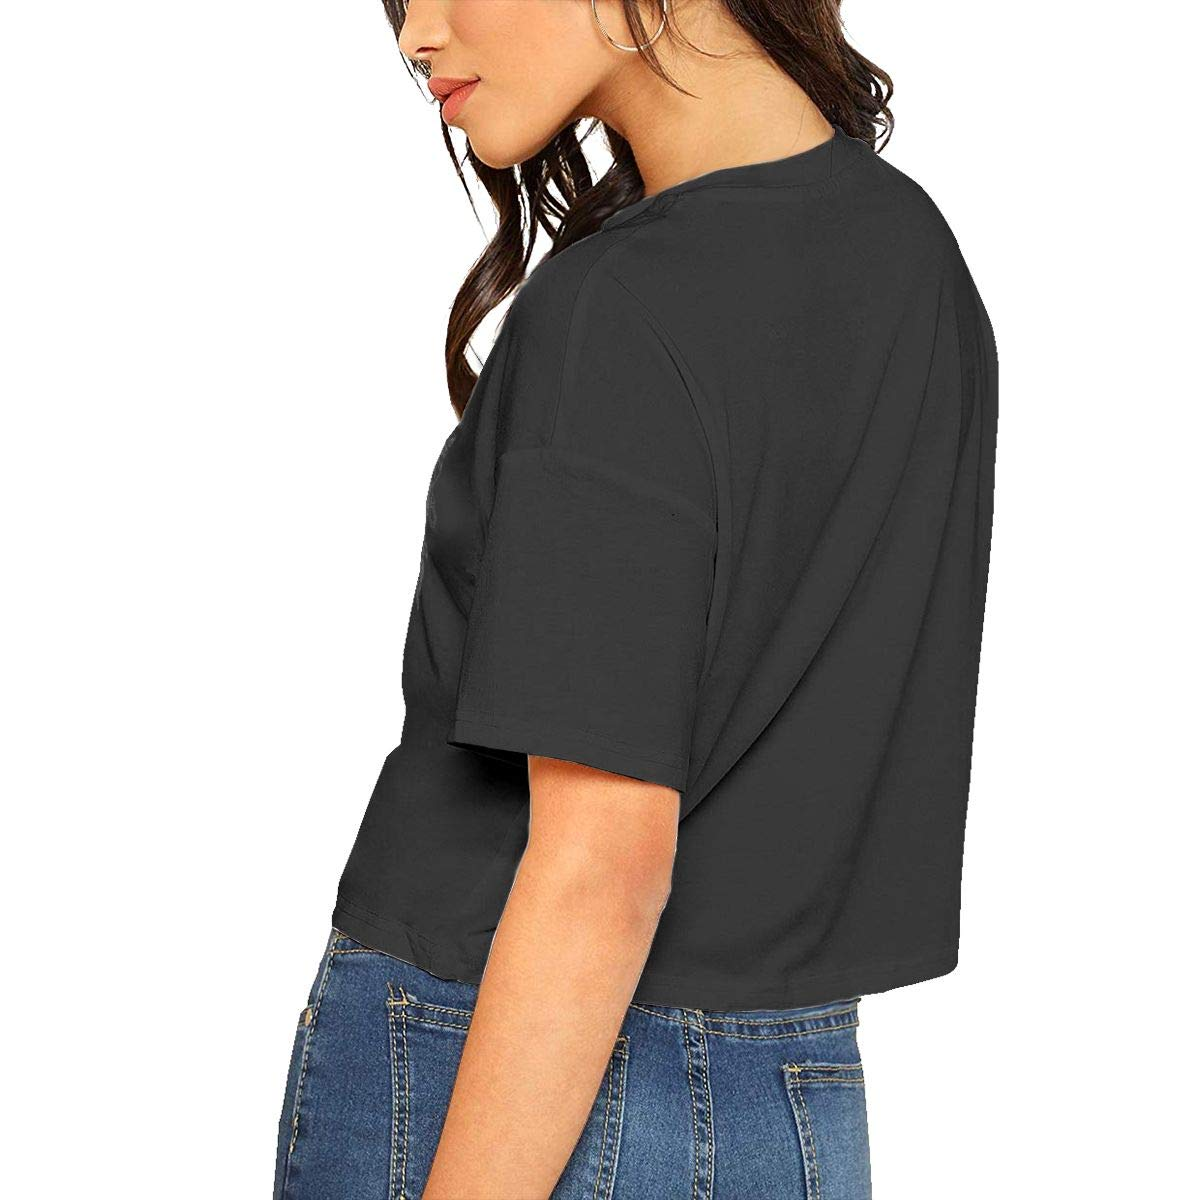 Wolf-Totem T-Shirt Womens Crop Tops Workout Top Shirts Slim Fit Shirt